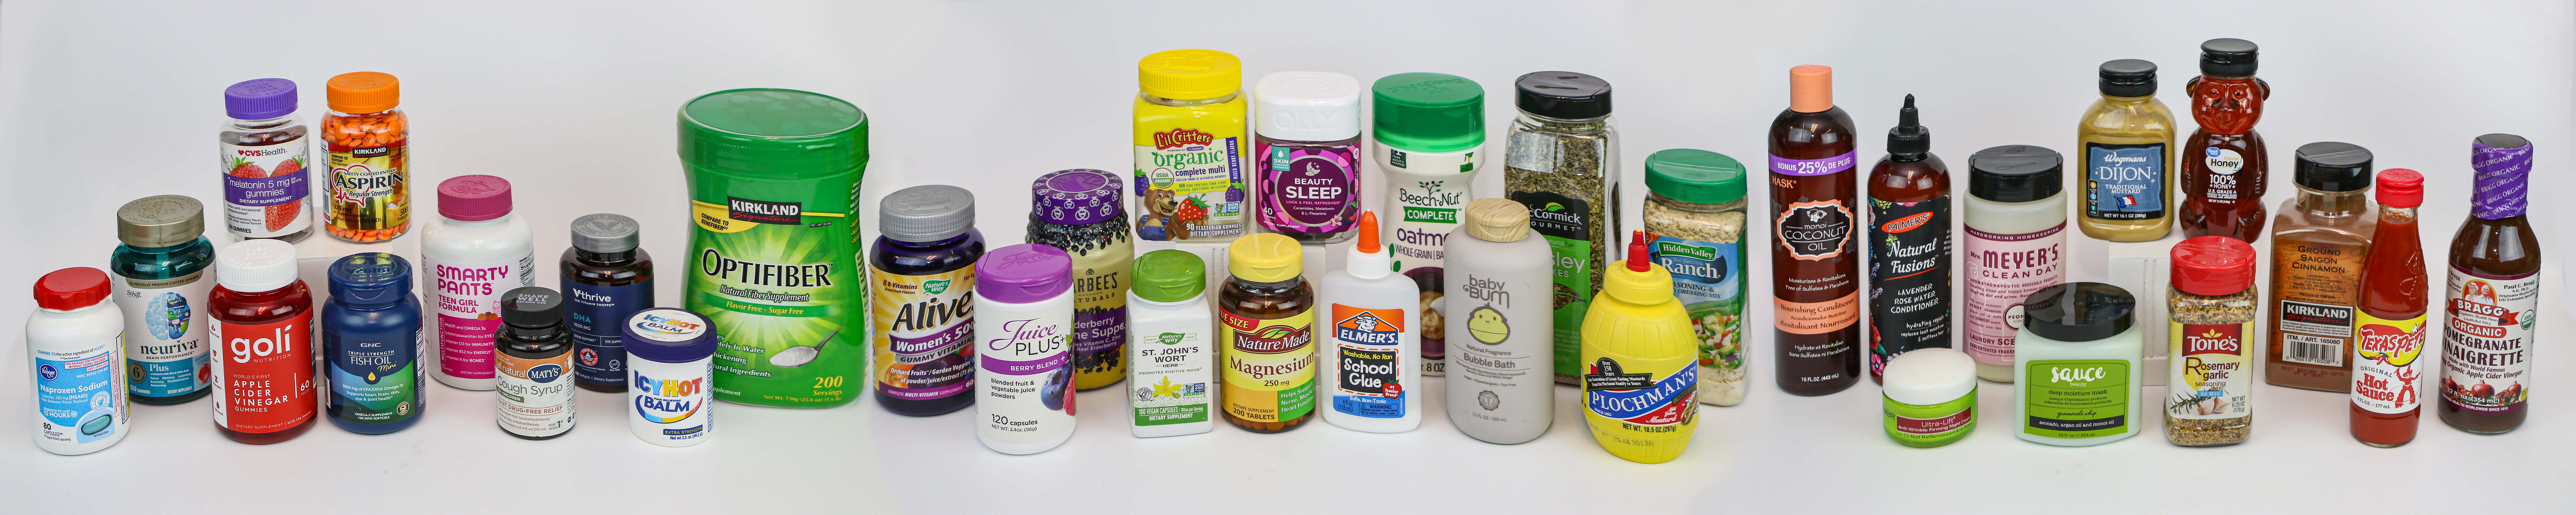 MRP Product Assortment photo